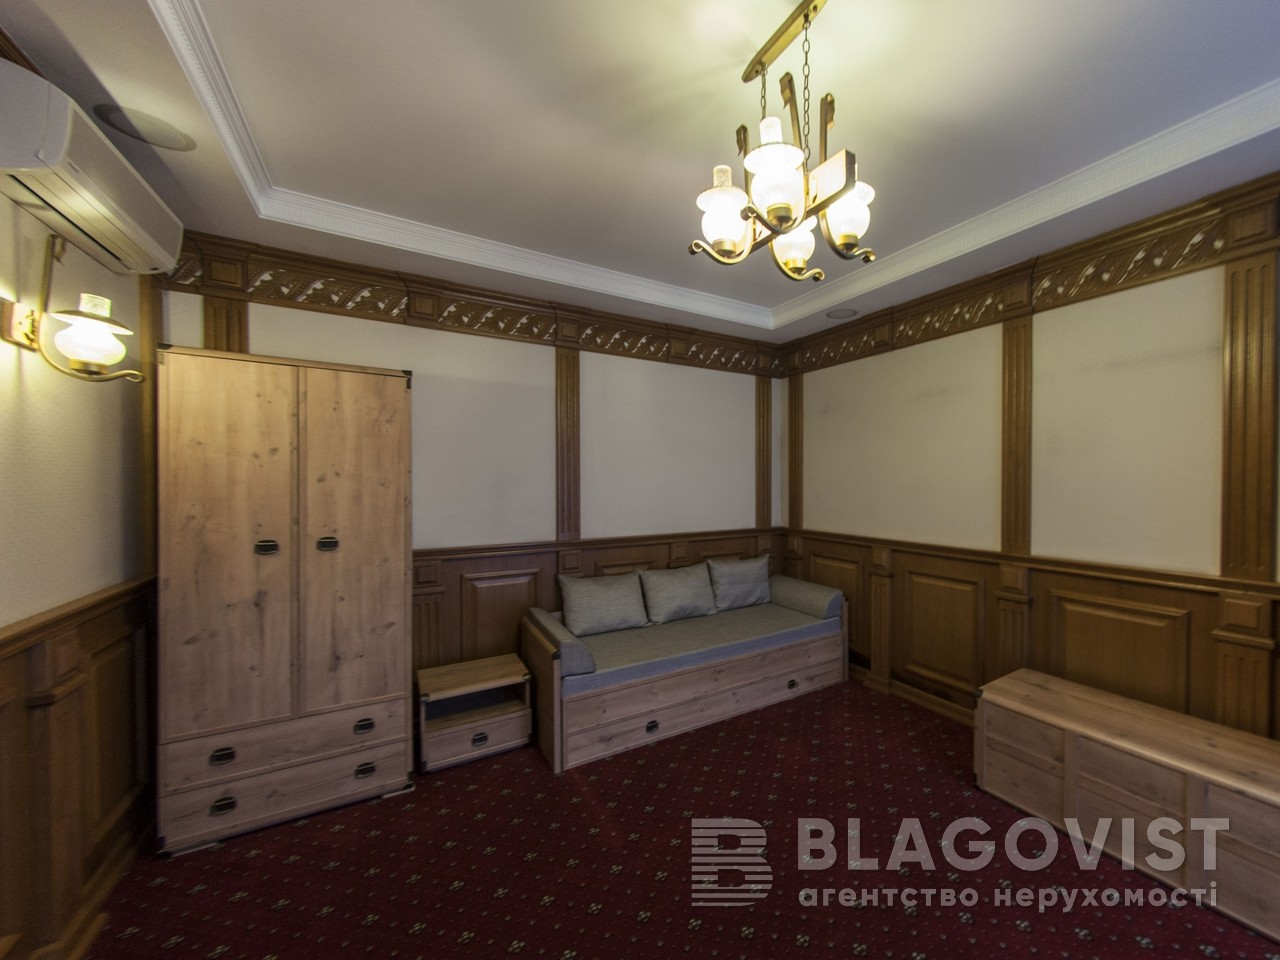 Квартира A-103686, Владимирская, 79, Киев - Фото 10